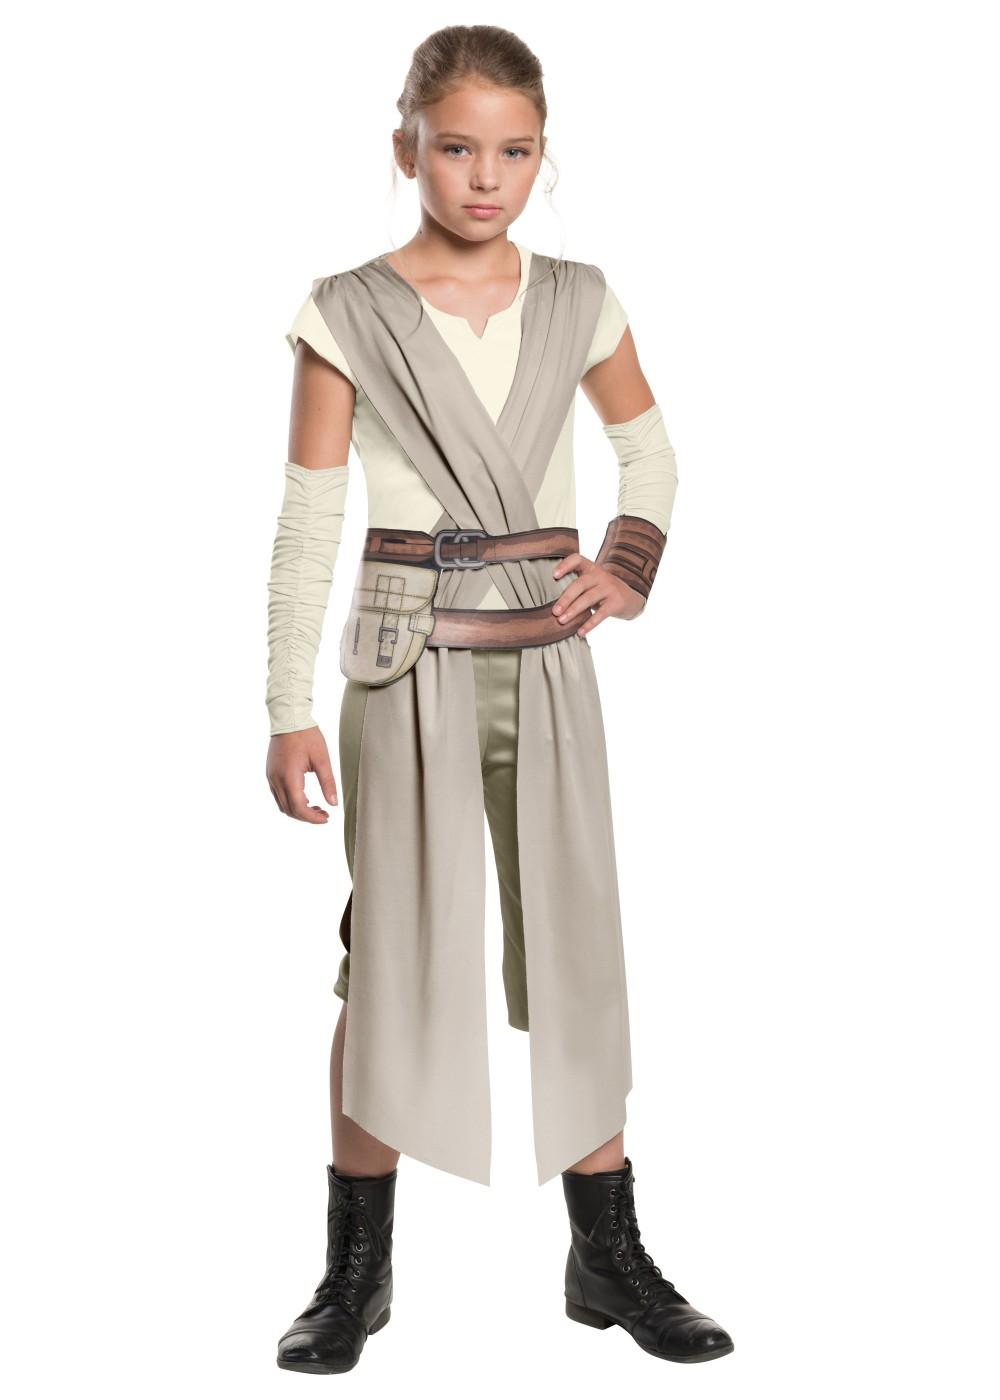 Girls Star Wars Rey Costume - Movie Costumes-8679